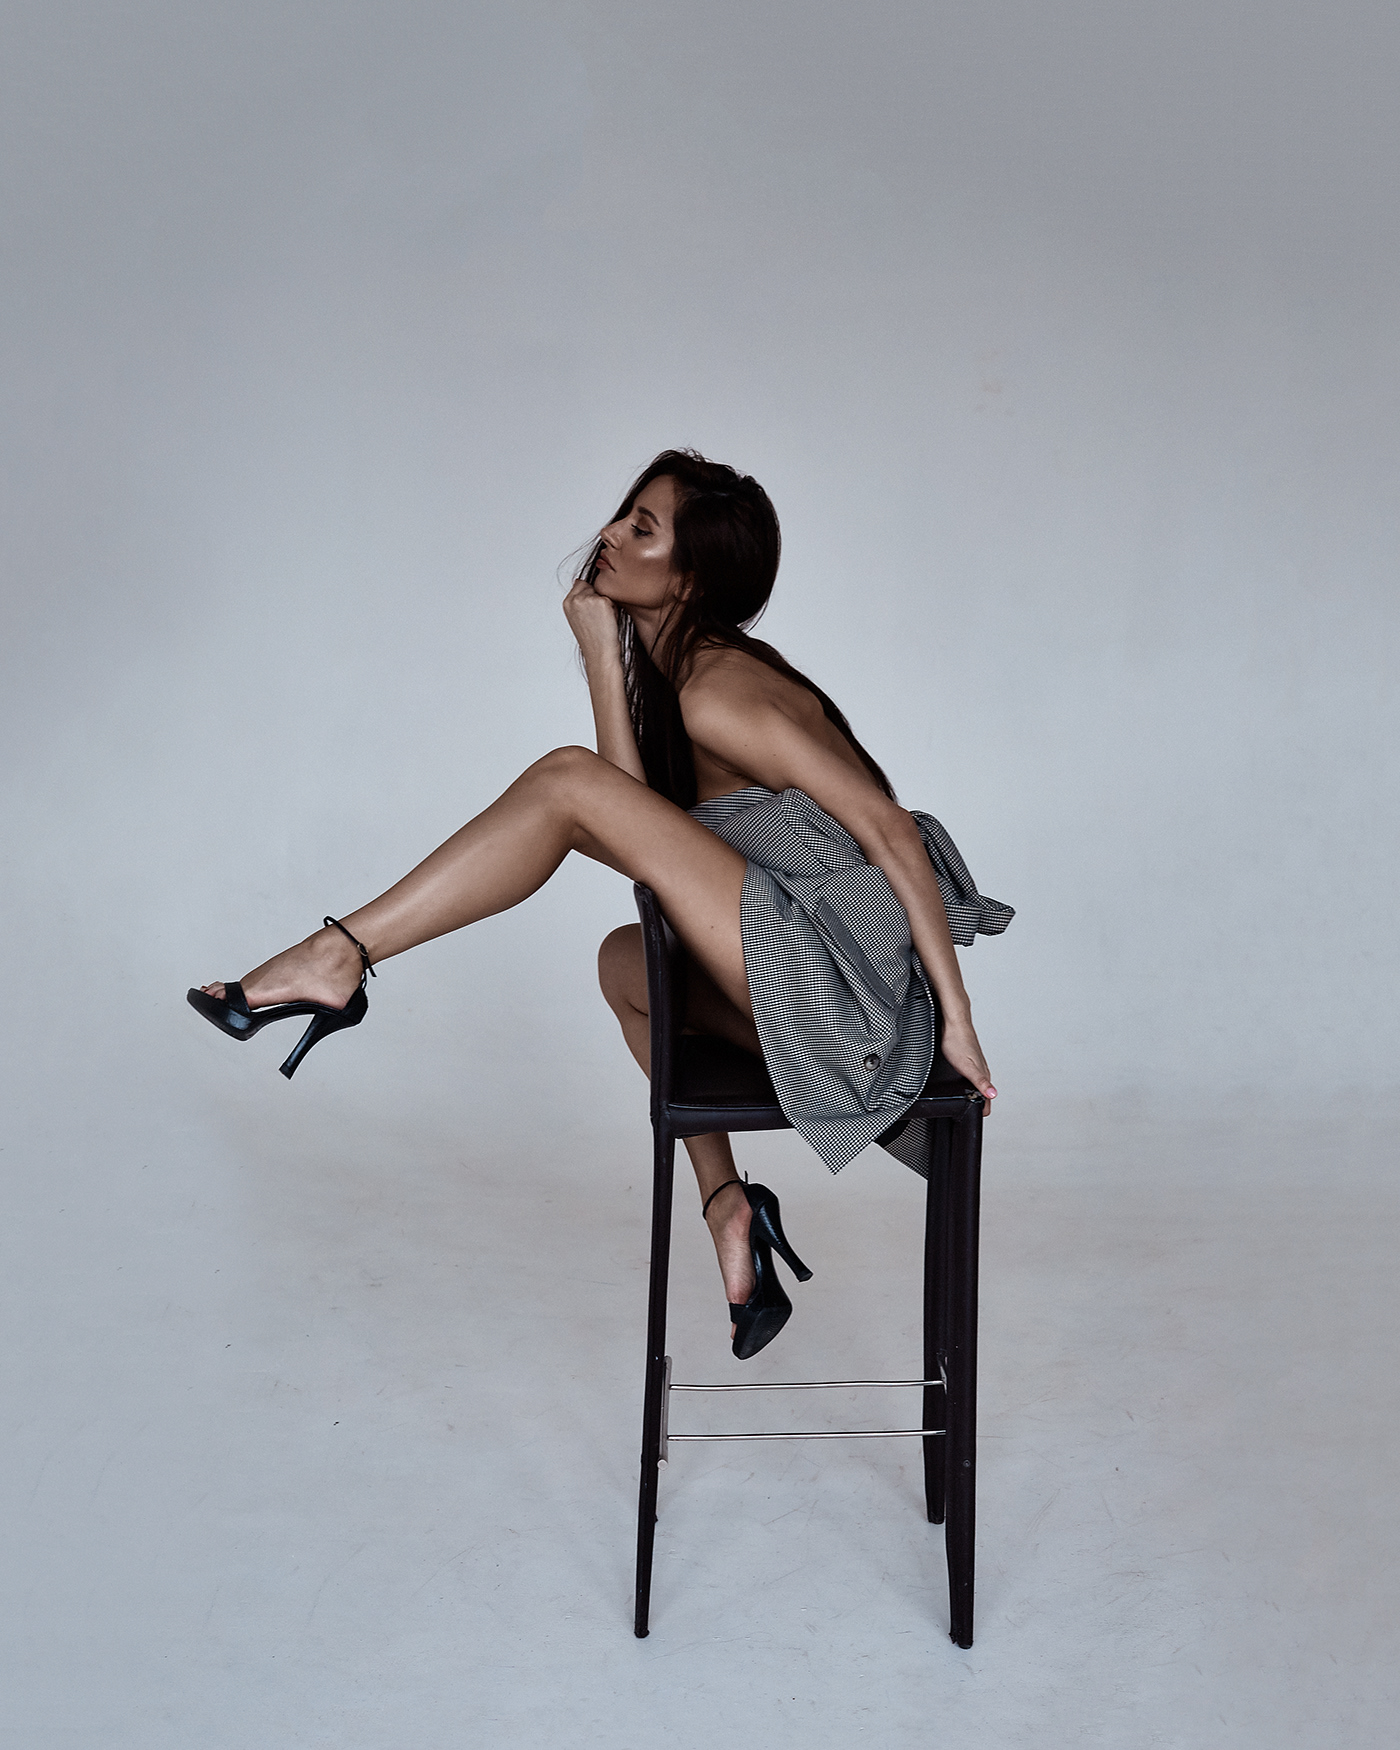 девушка фотография Fashion  fashion photography Hot top editorial magazine